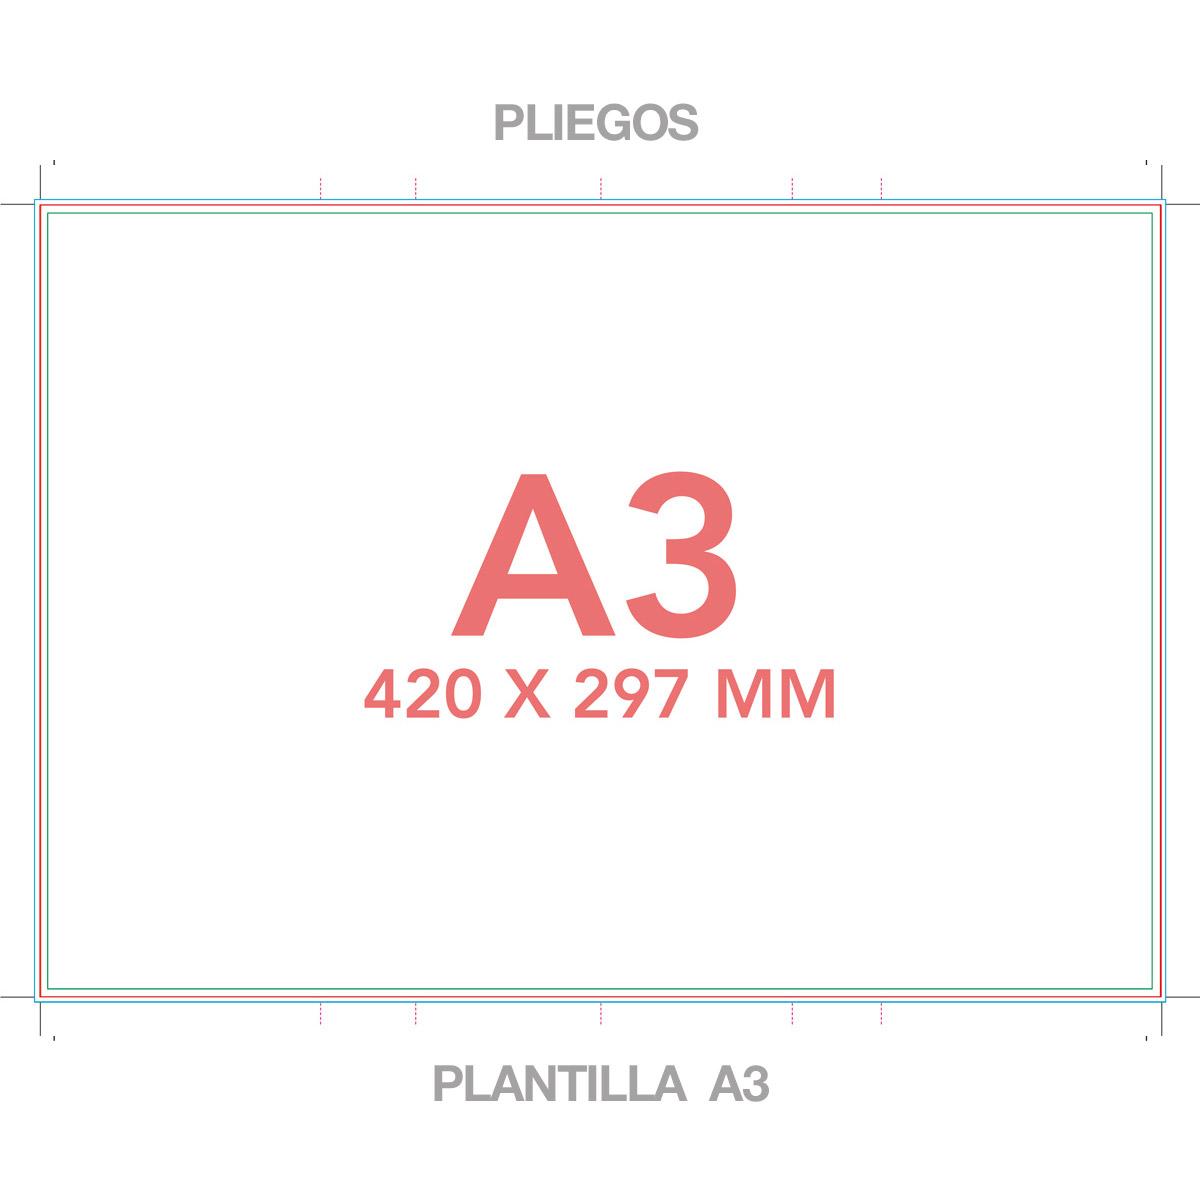 Bonito Plantilla A3 Fotos - Ejemplo De Currículum Comercial Ideas ...